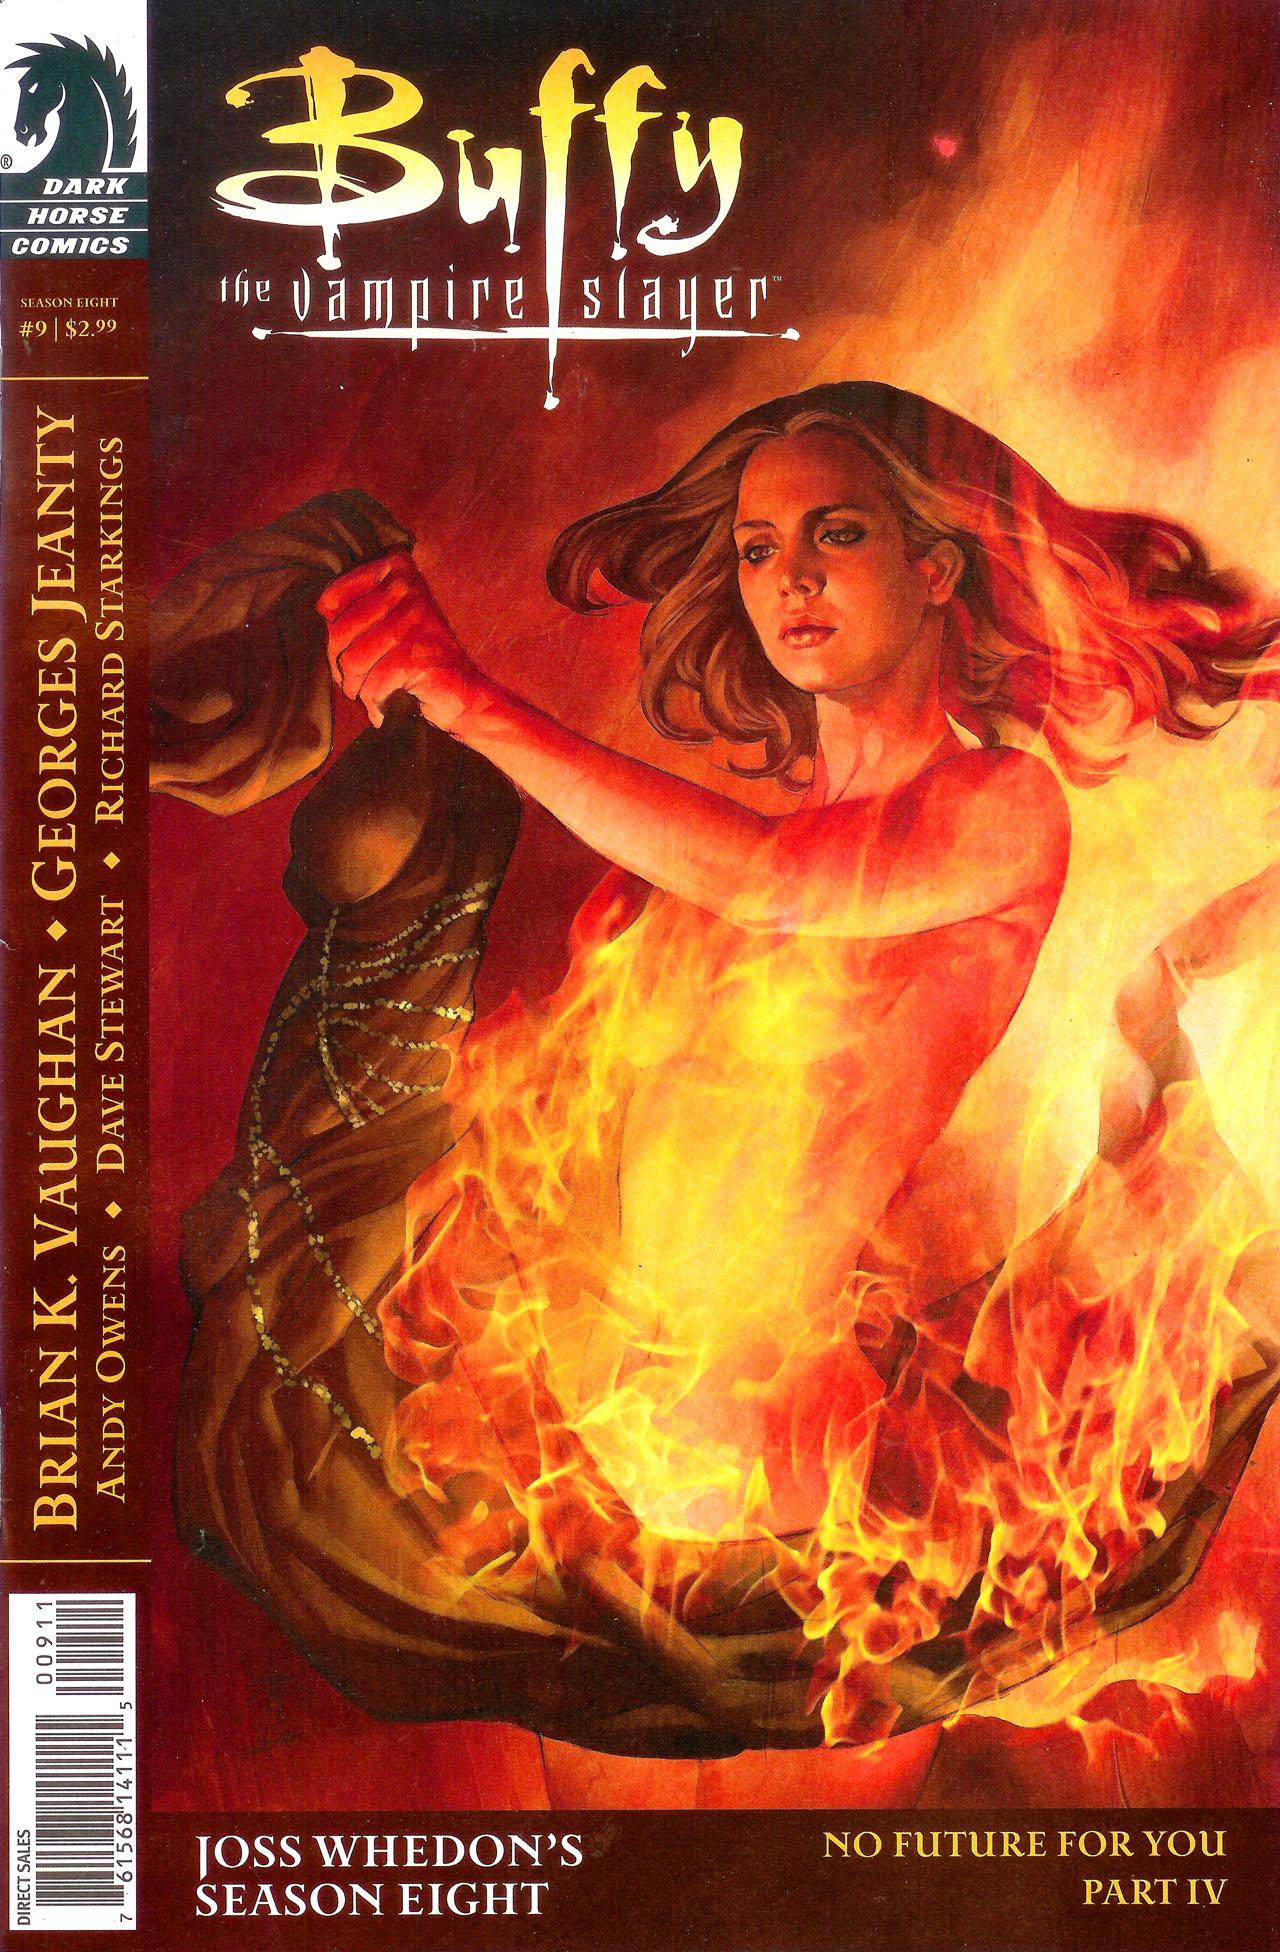 Buffy the Vampire Slayer Season Eight 9 Page 1